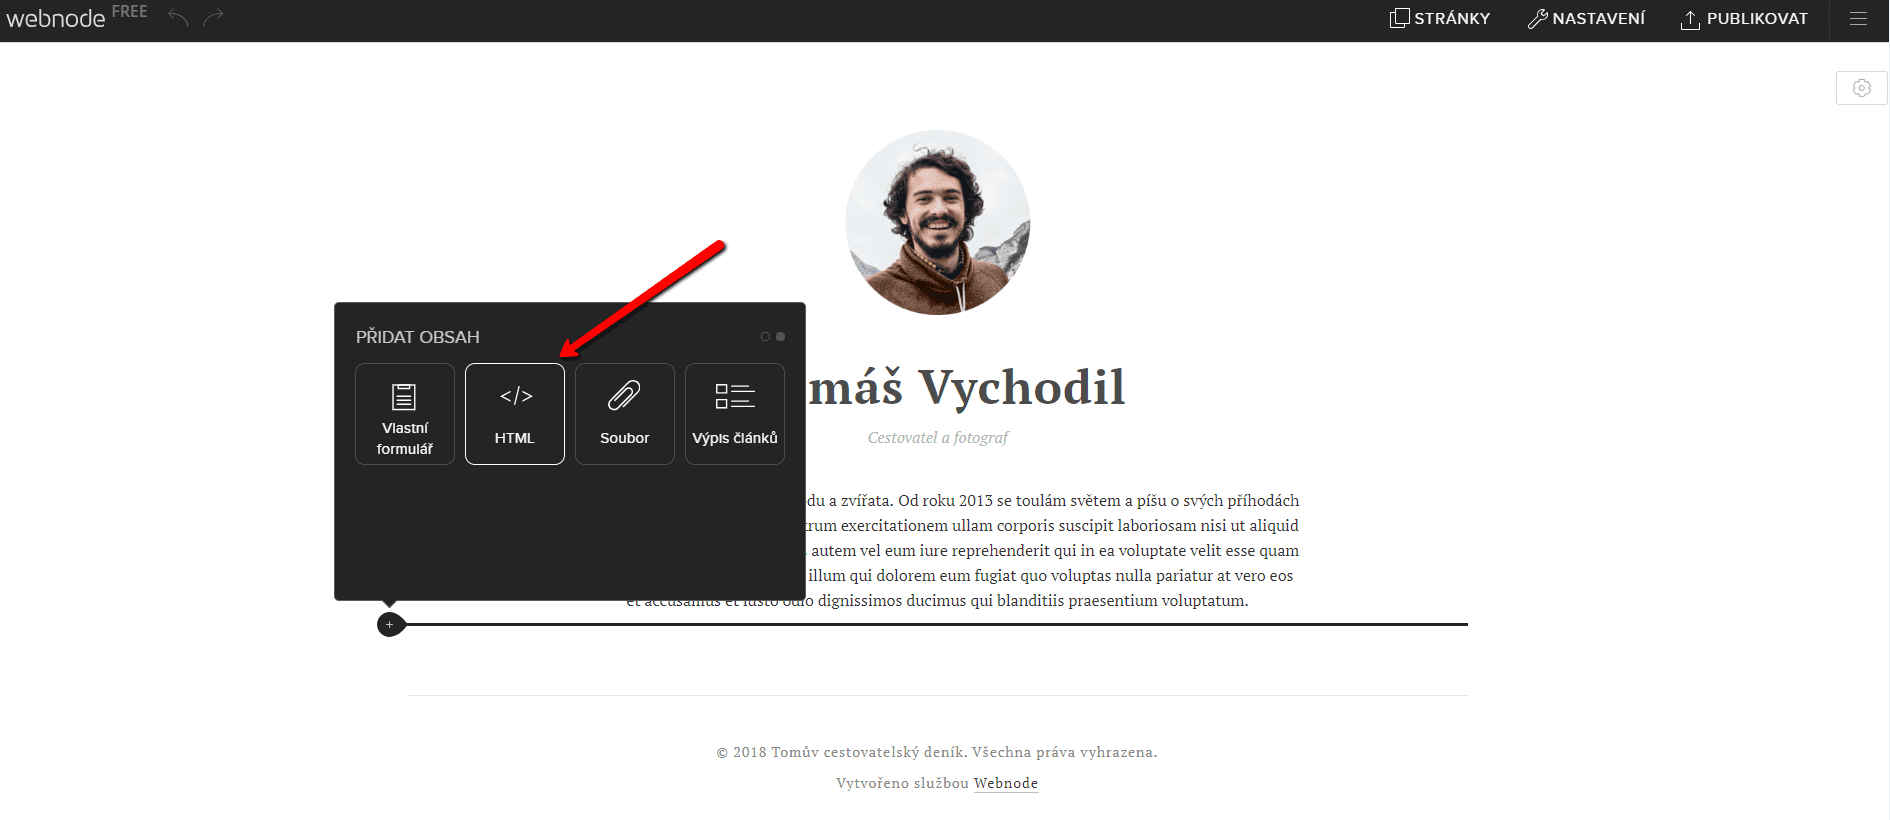 Vložte kód na web